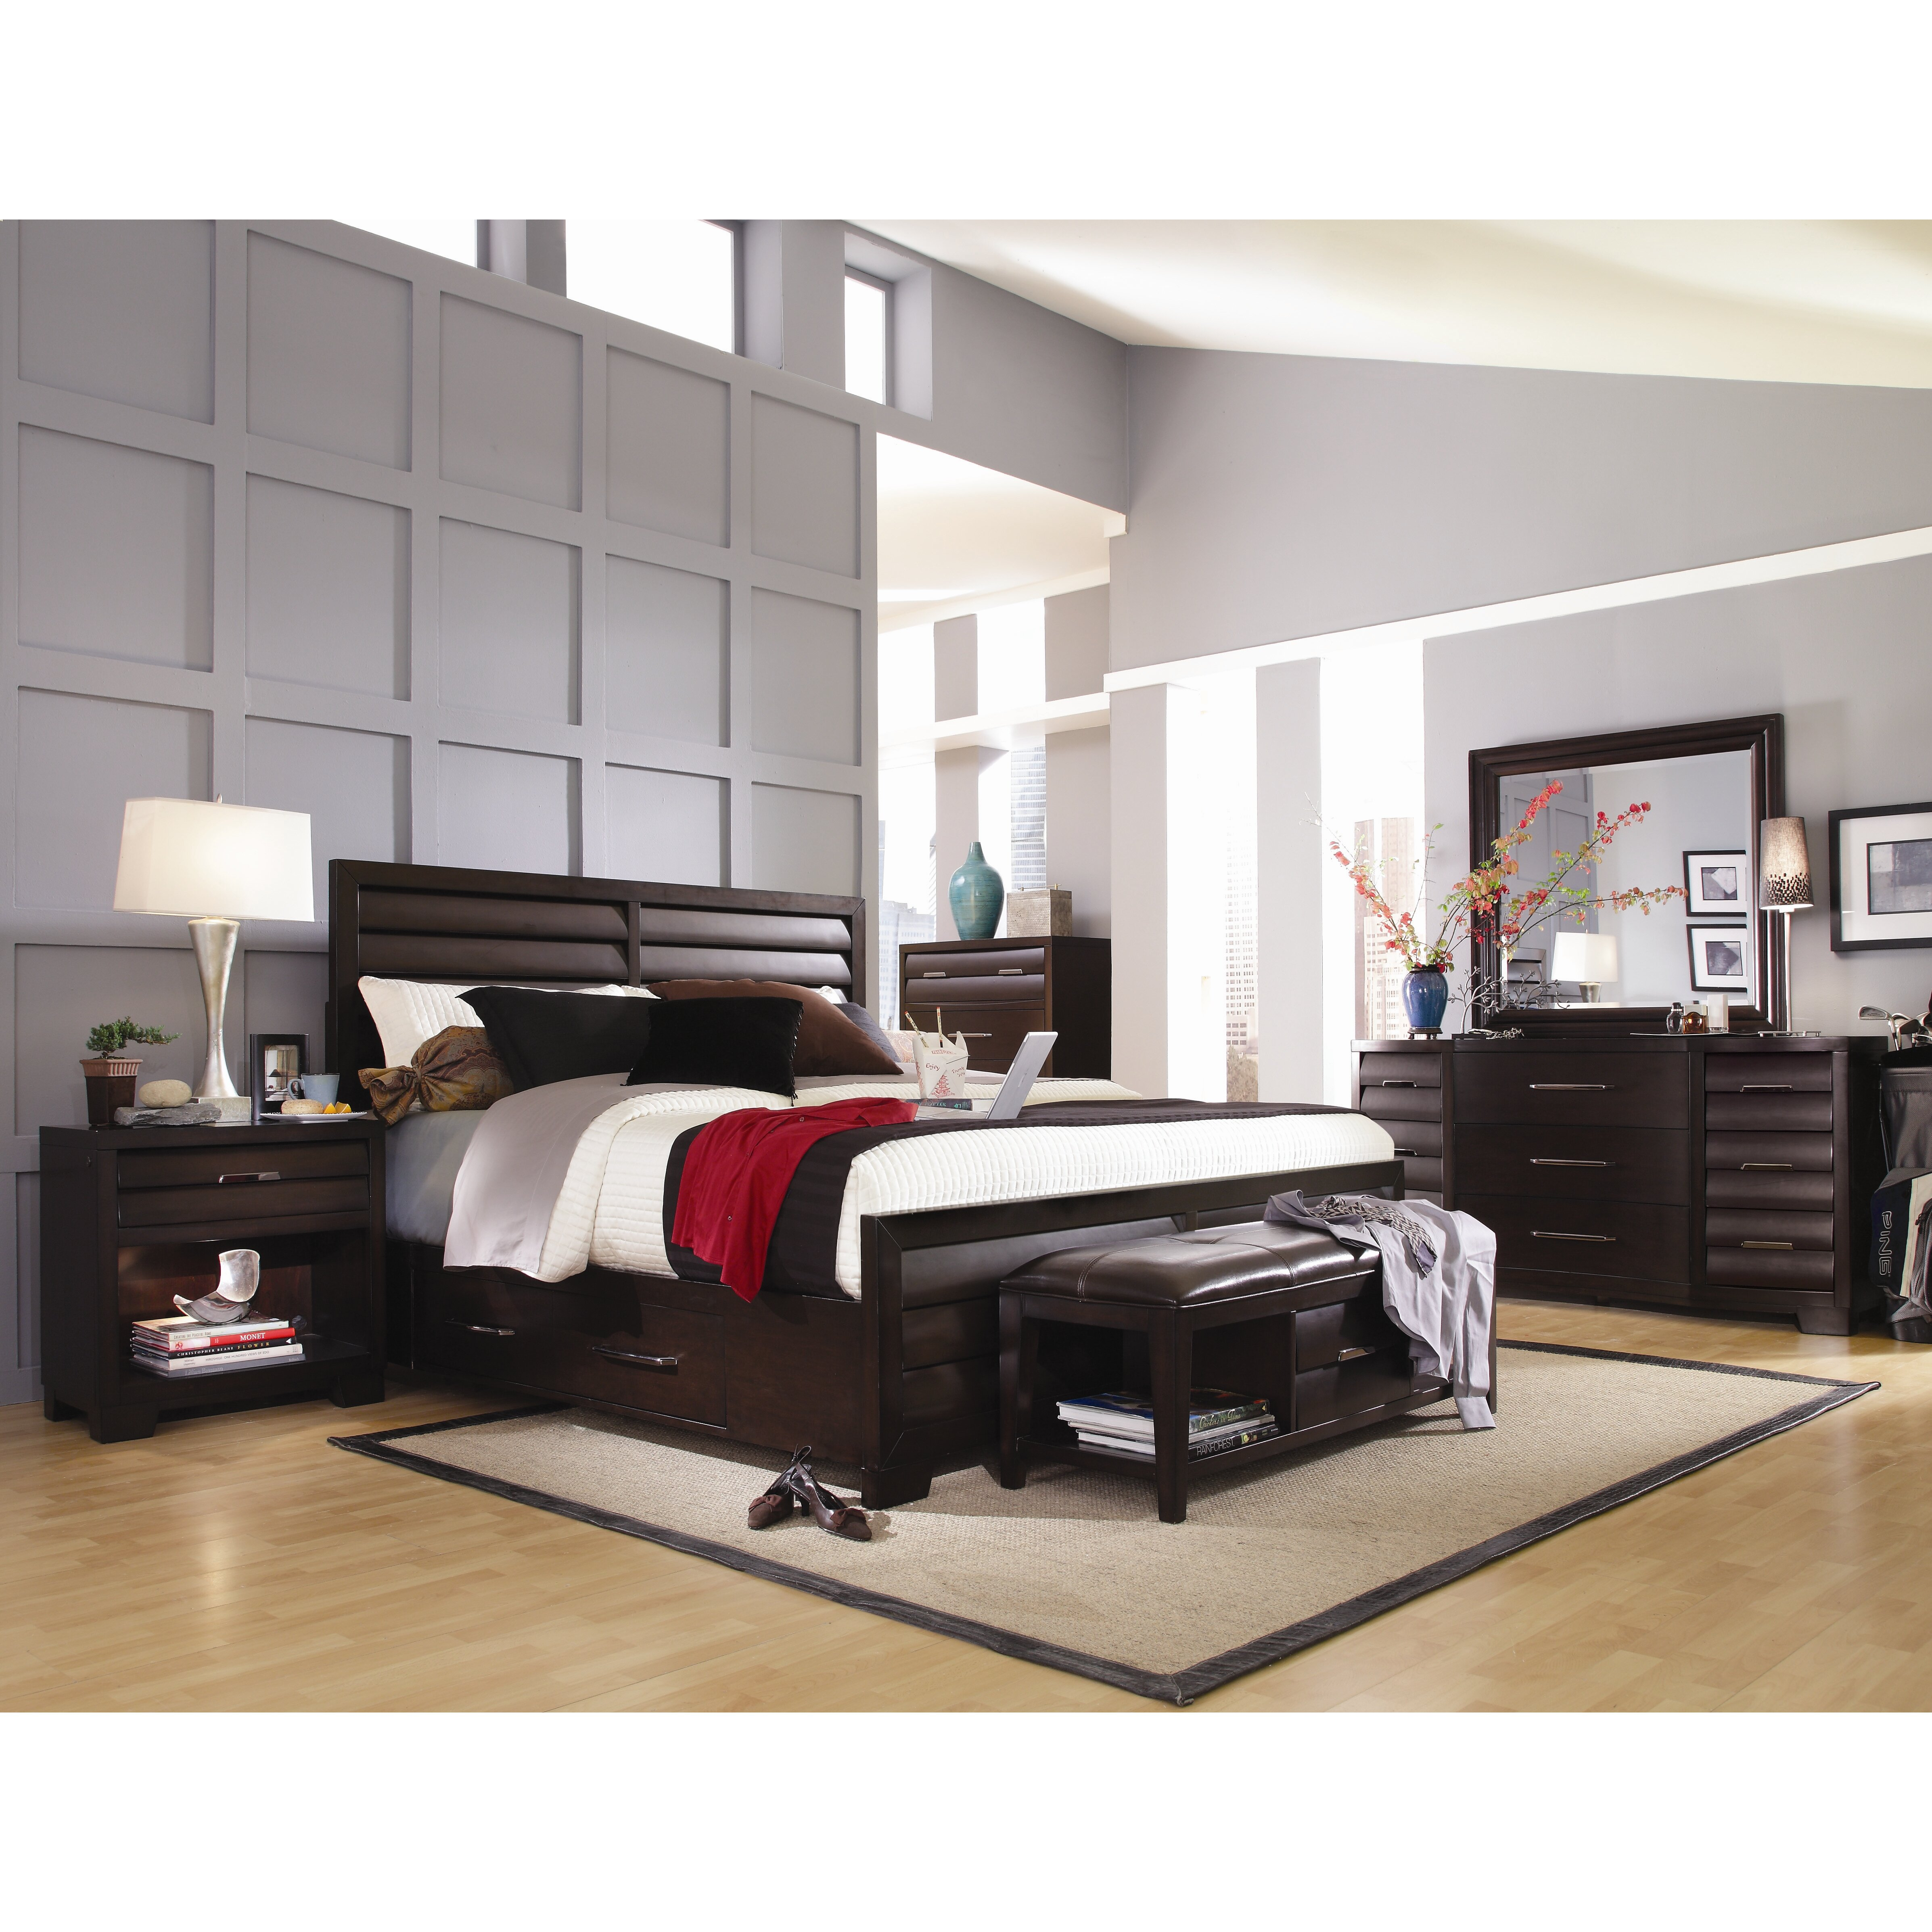 Pulaski Tangerine 330 Panel Customizable Bedroom Set